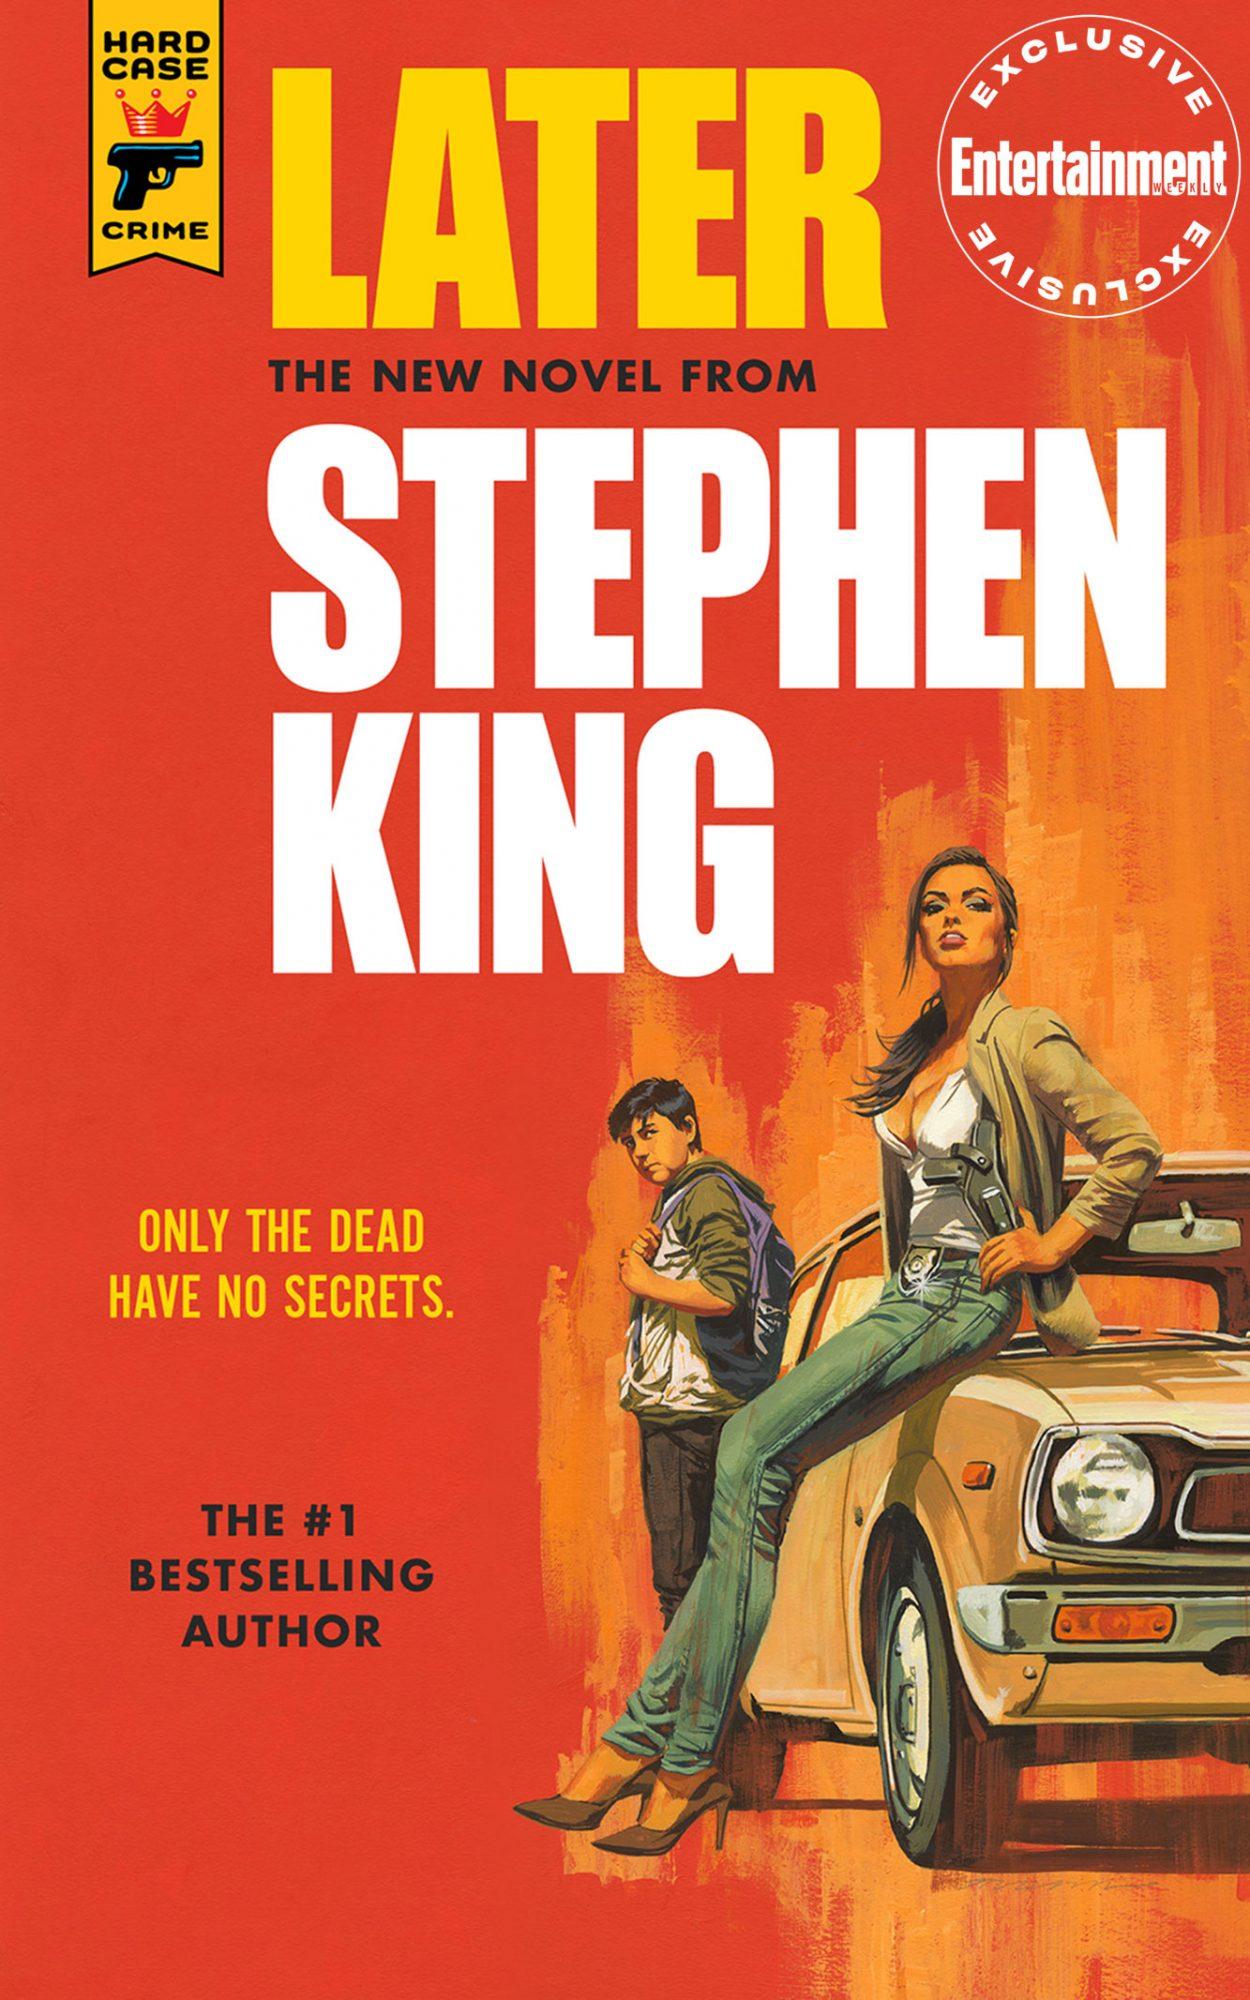 Обложка нового романа Стивена Кинга «Позже» — выходит вмарте 2021-го 1